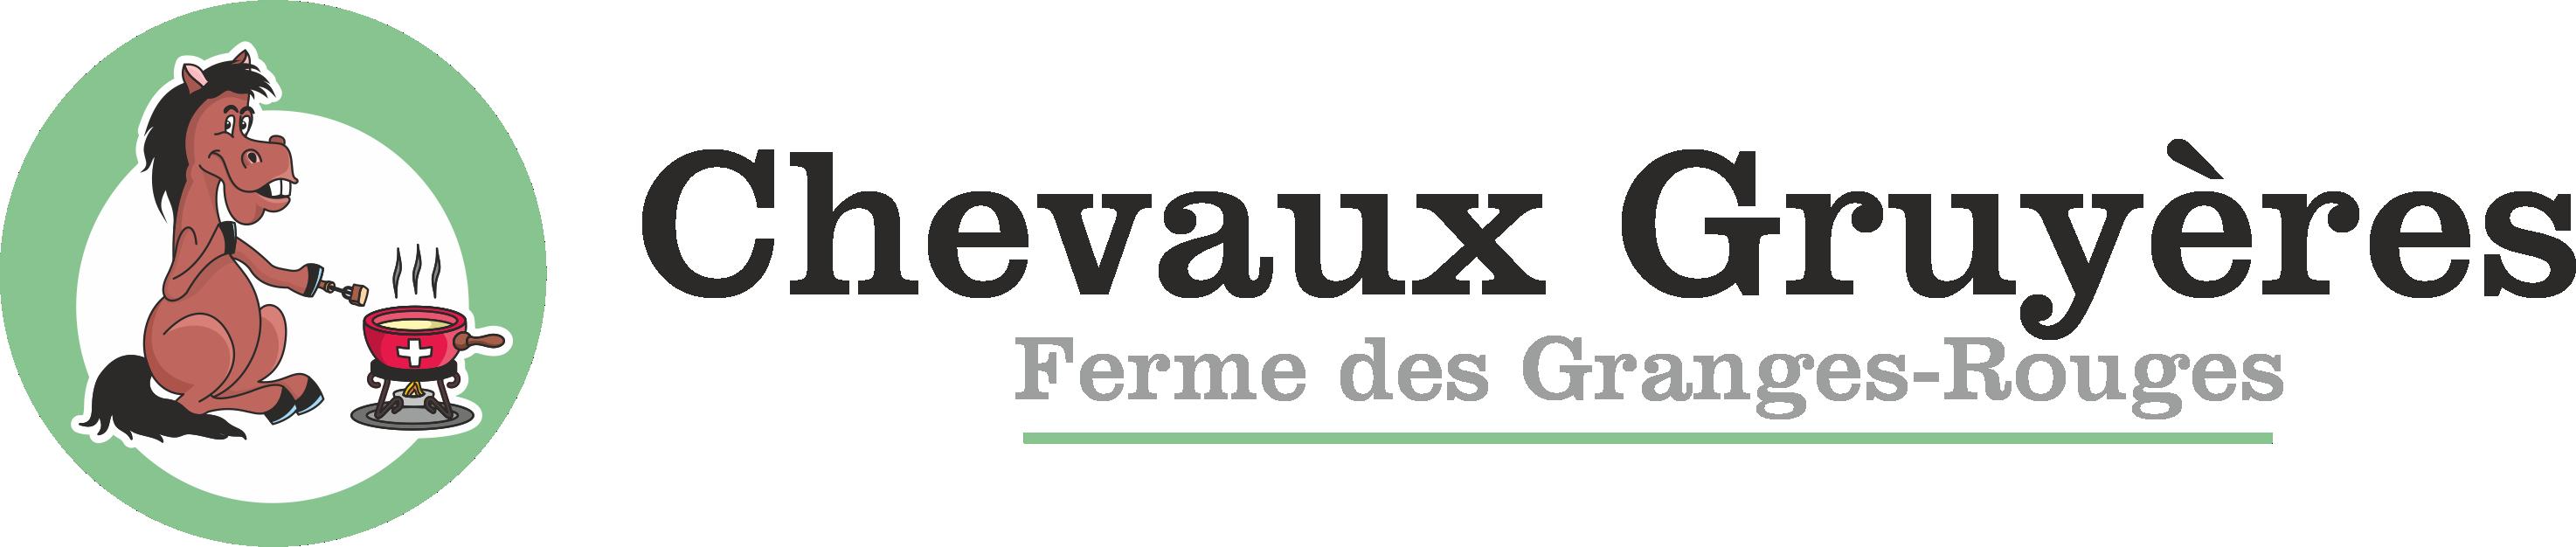 Chevaux Gruyères